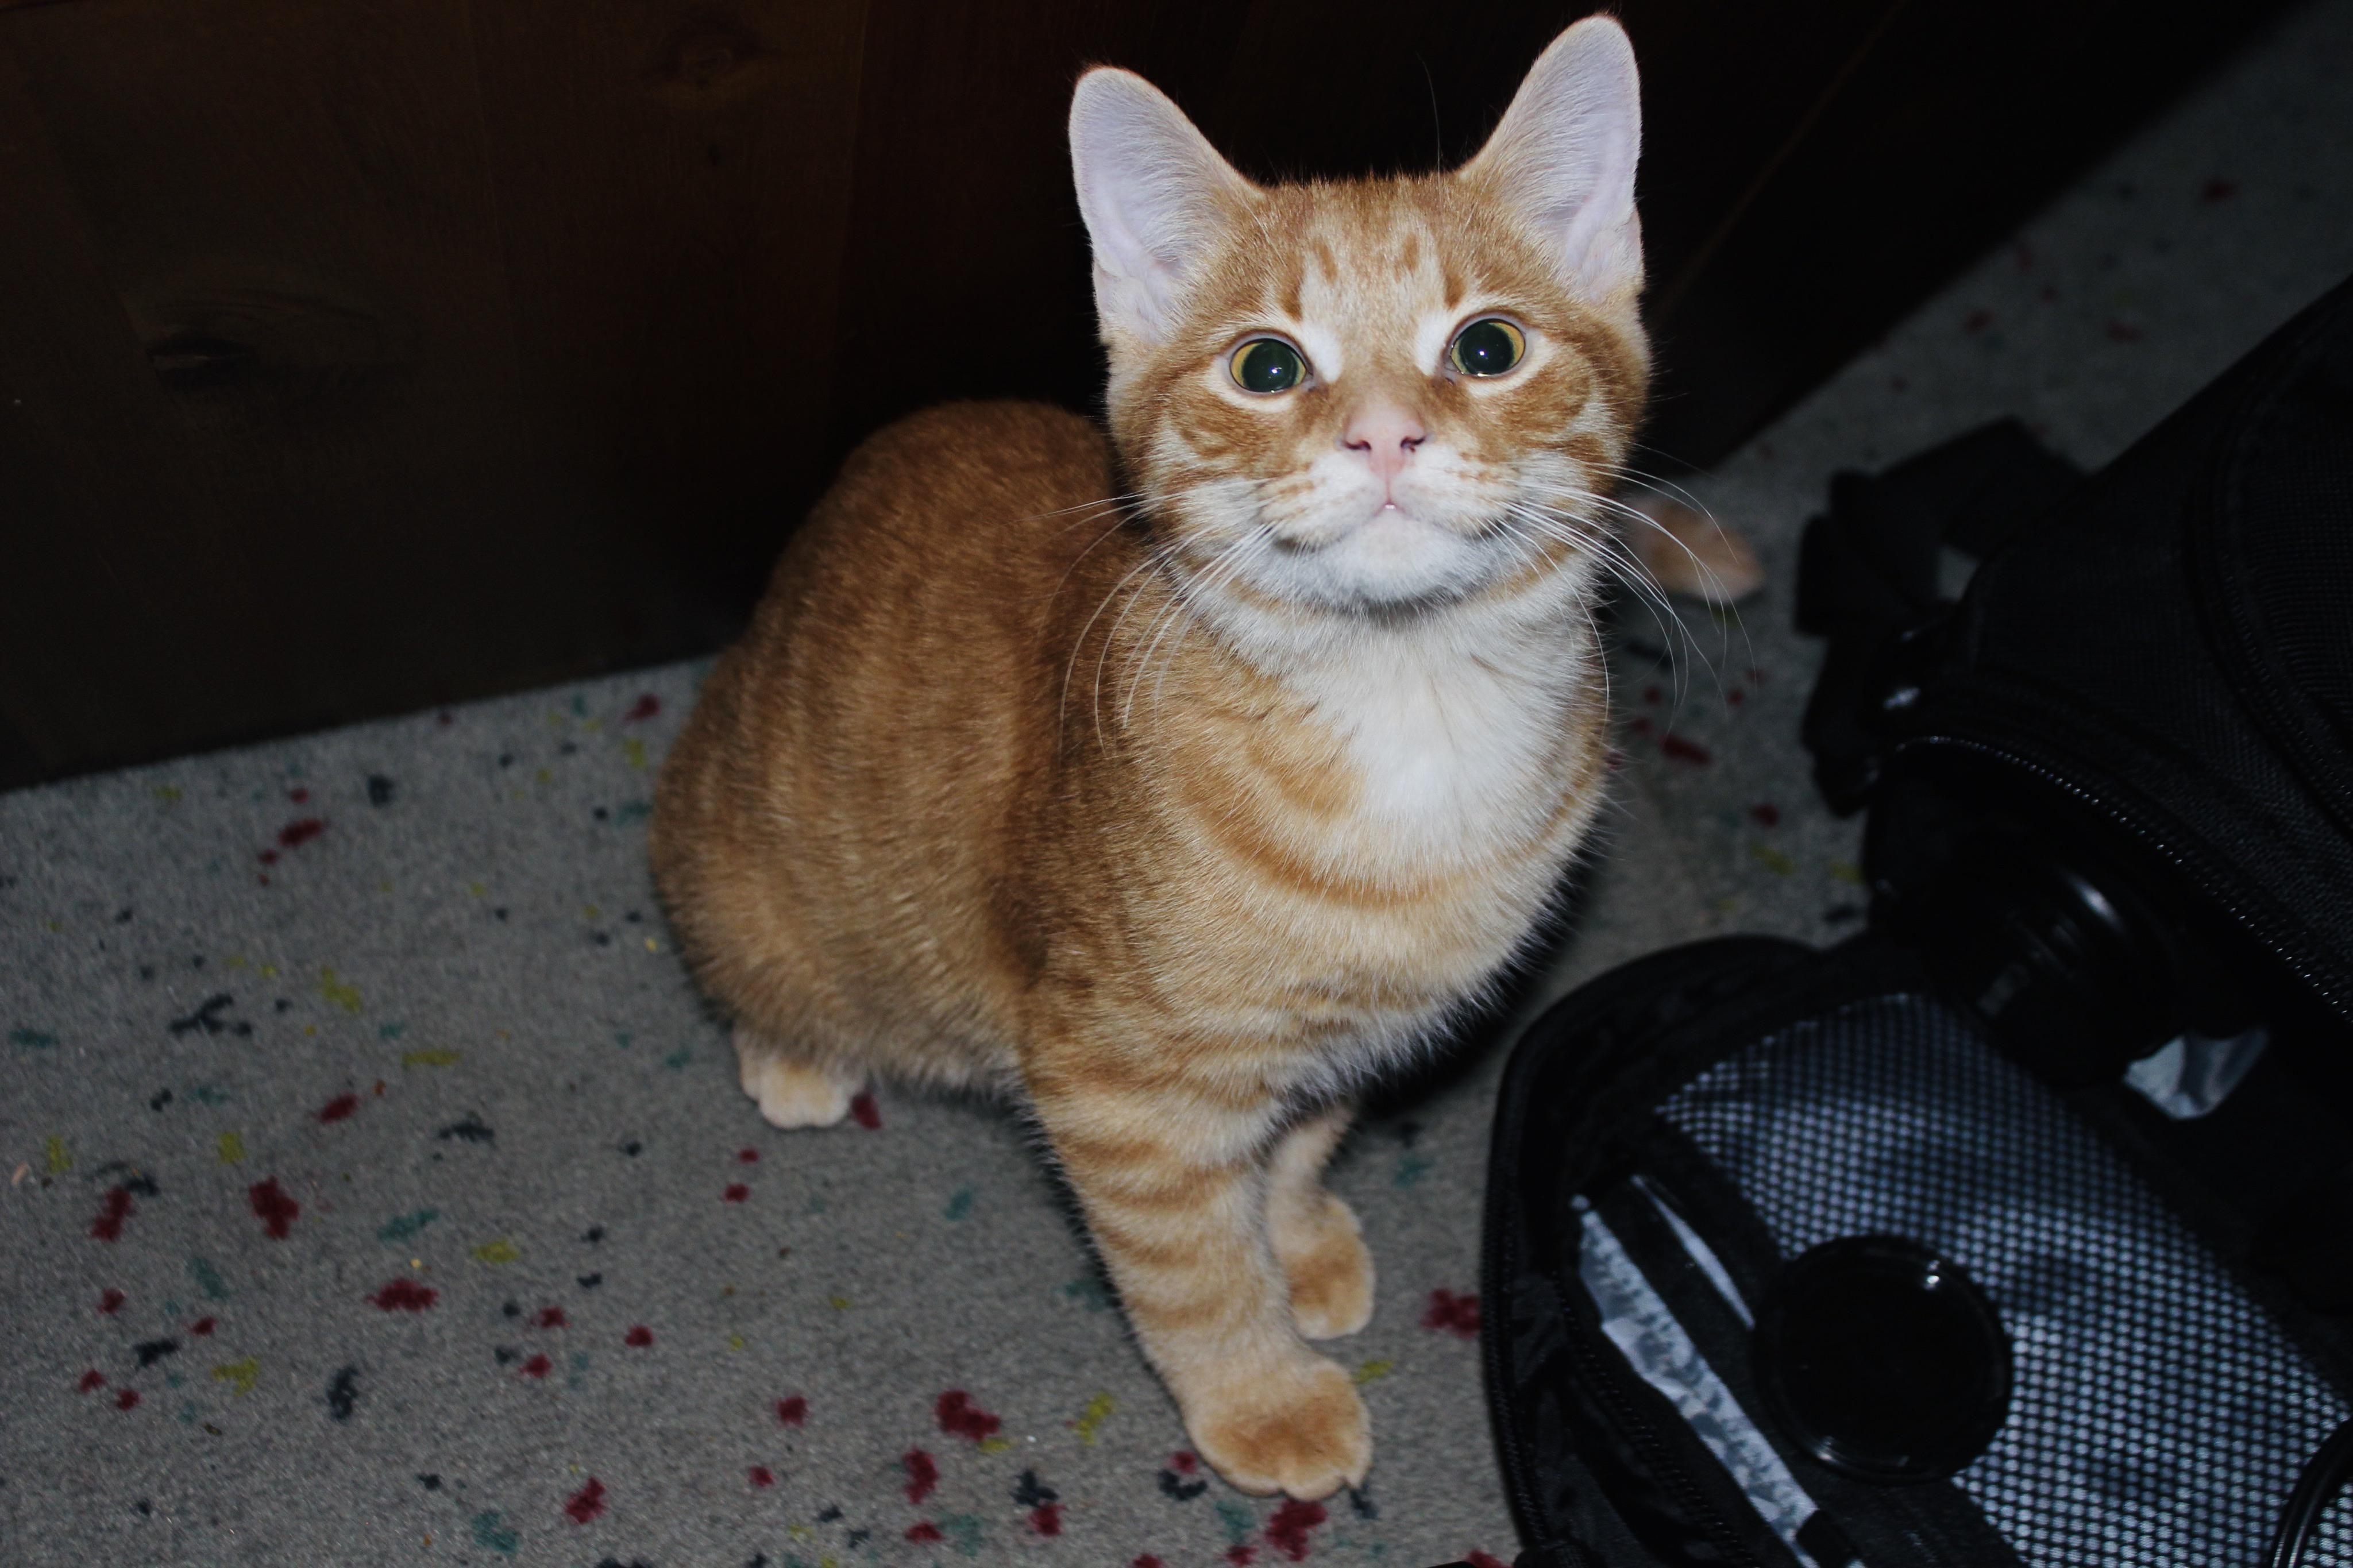 My Baby Boy In His Teenage Phase Https Ift Tt 2ctigk3 In 2020 Kitten Cat S Cat Pics